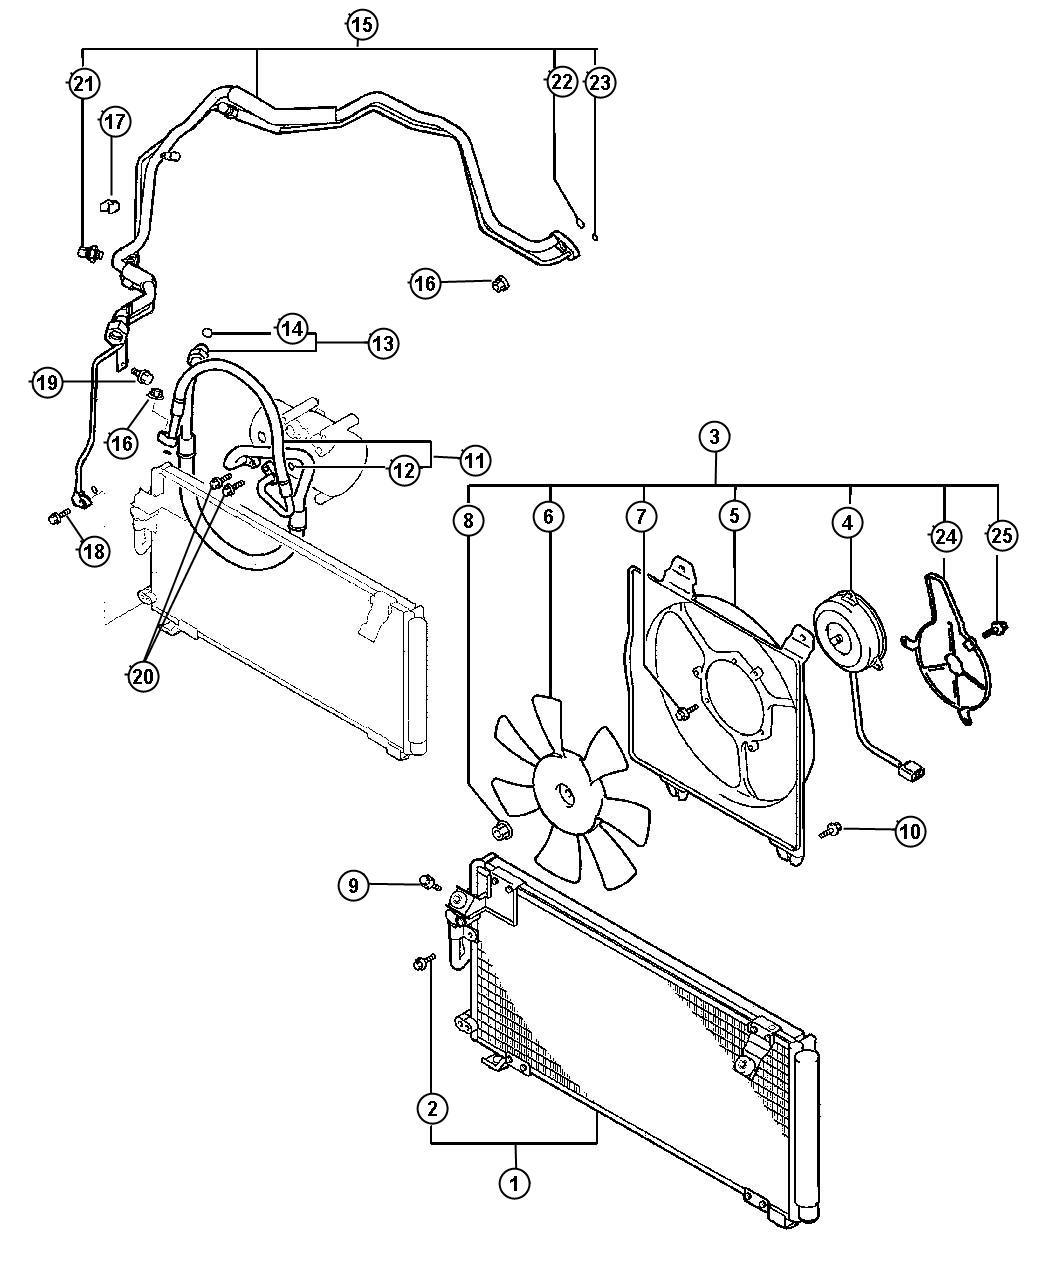 Chrysler Sebring Condenser Air Conditioning Magneti